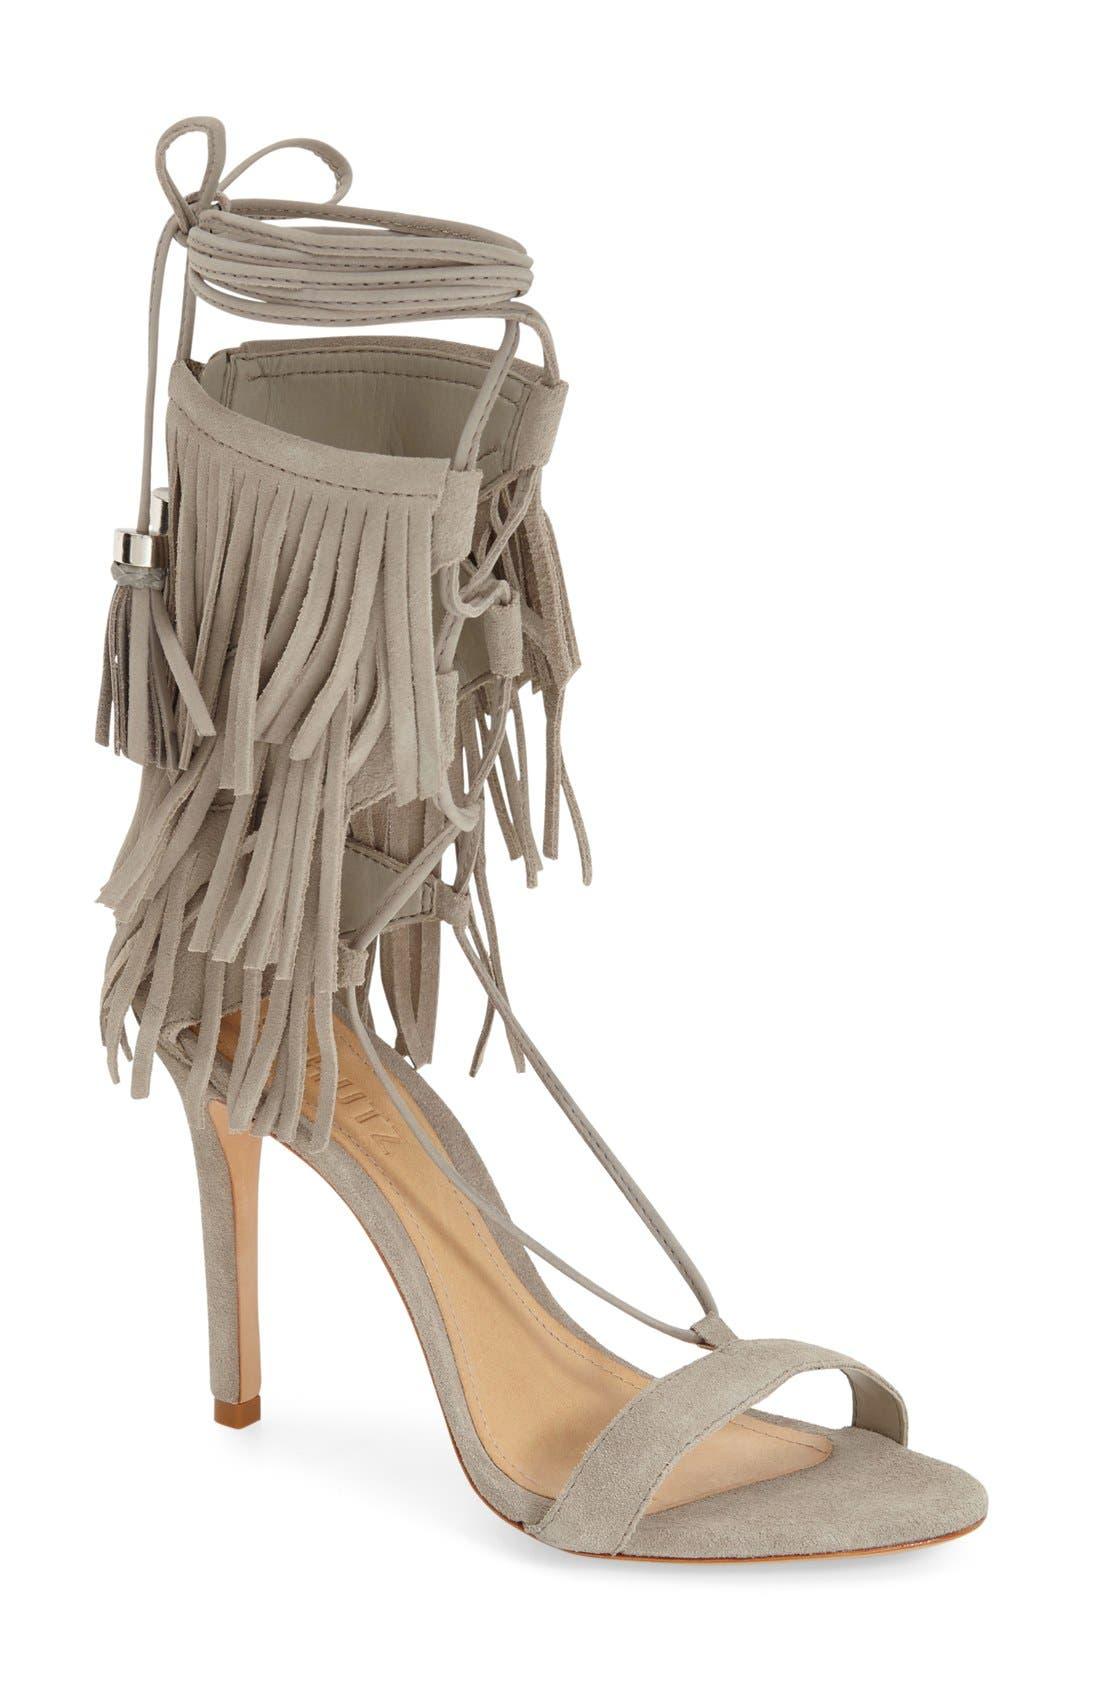 Alternate Image 1 Selected - Schutz 'Kija' Sandal (Women)